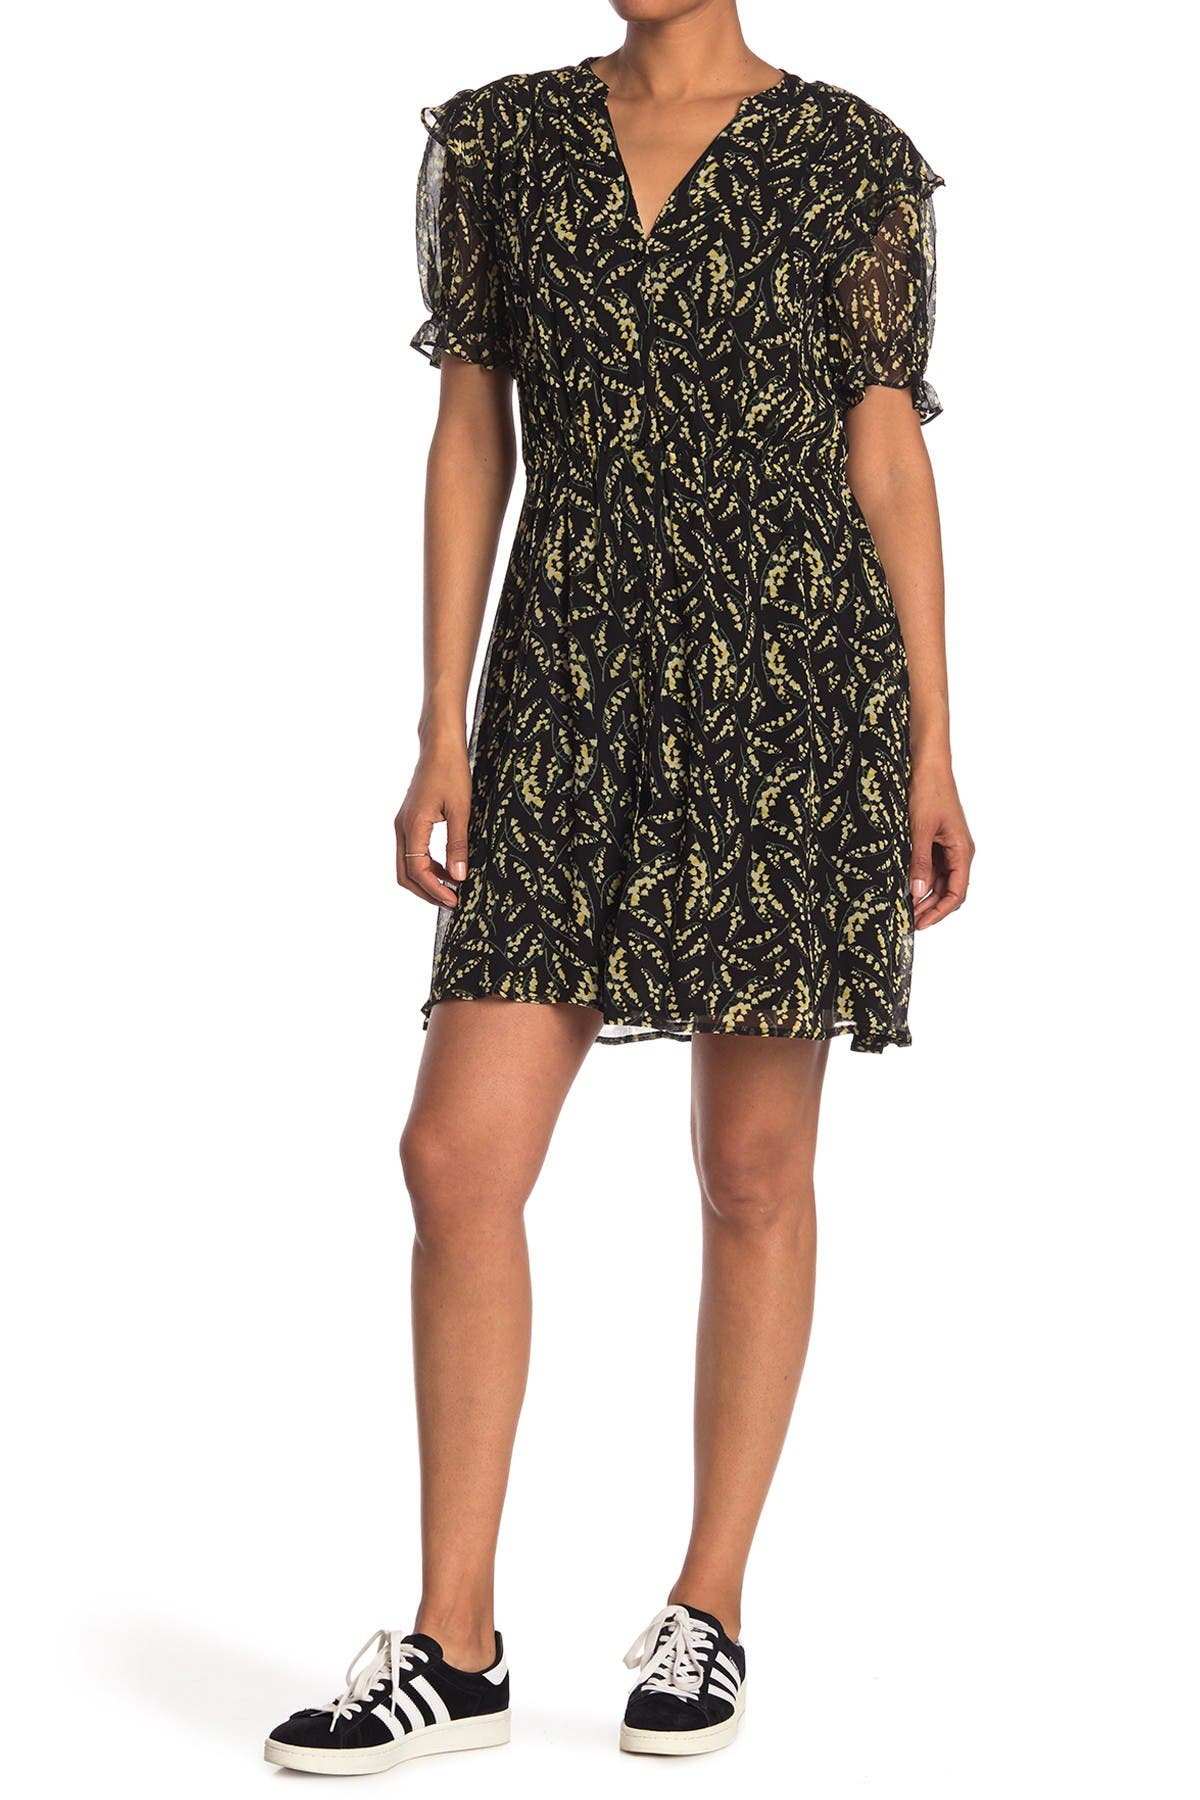 Image of ba&sh Matcha Printed Puff Sleeve Dress